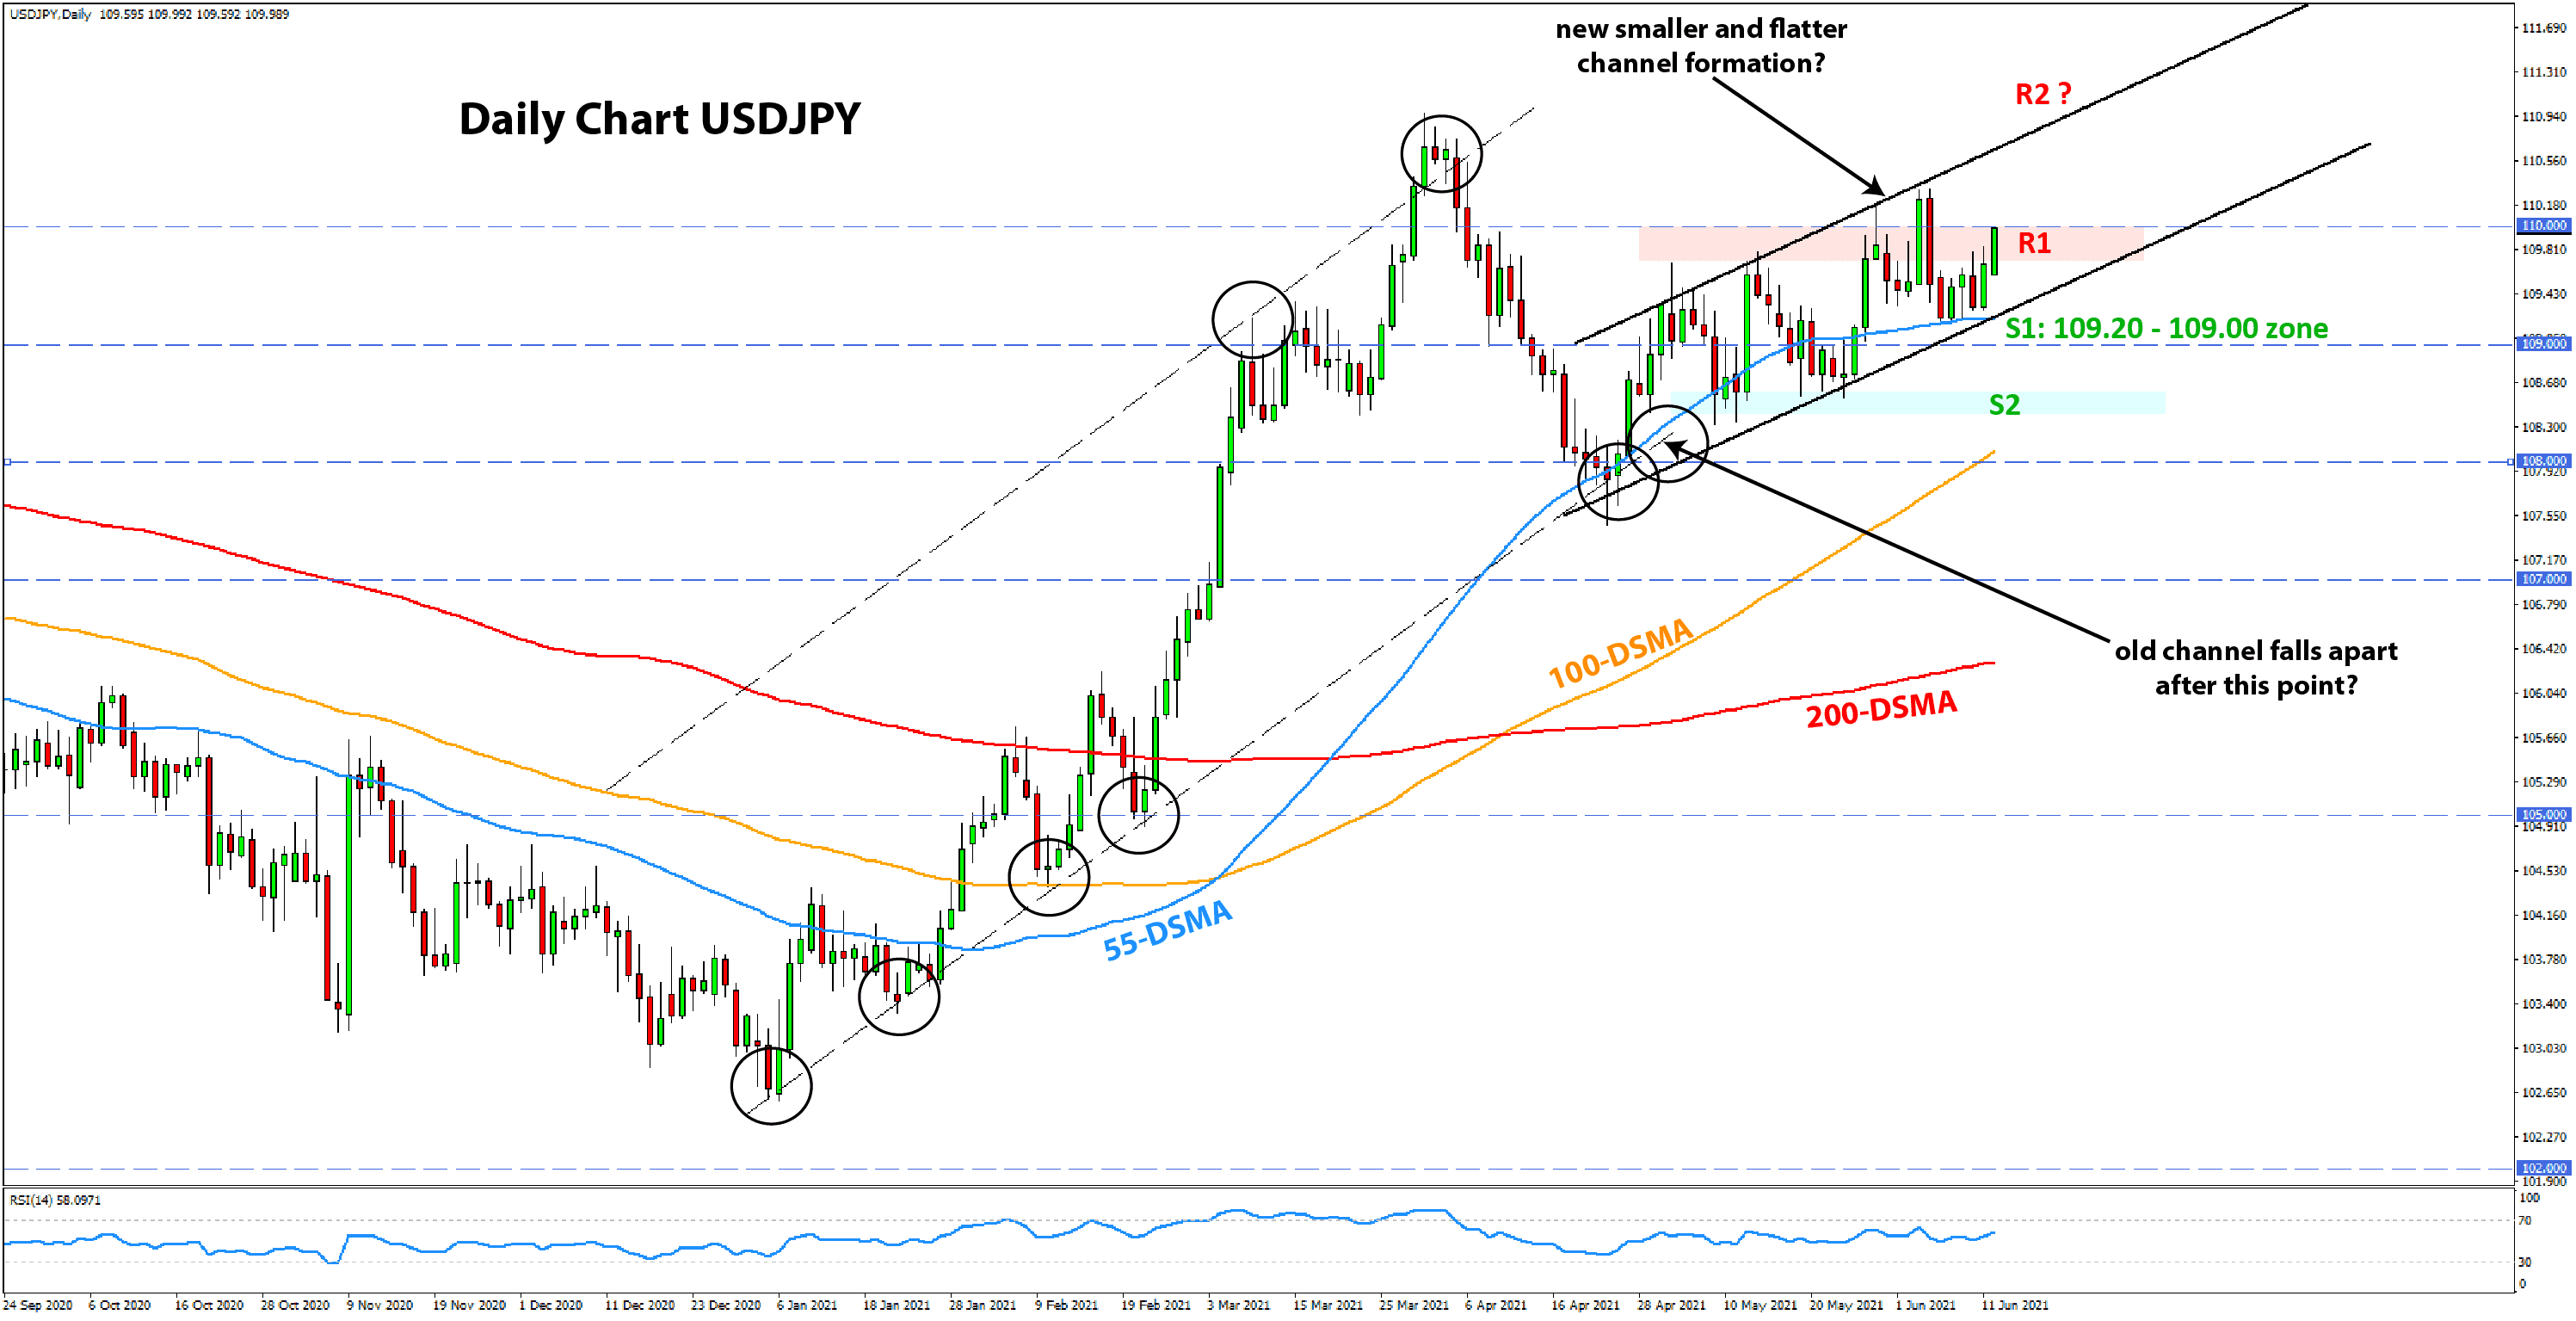 Weekly EURUSD, GBPUSD, USDJPY Forex Analysis June 14 - June 21, 2021